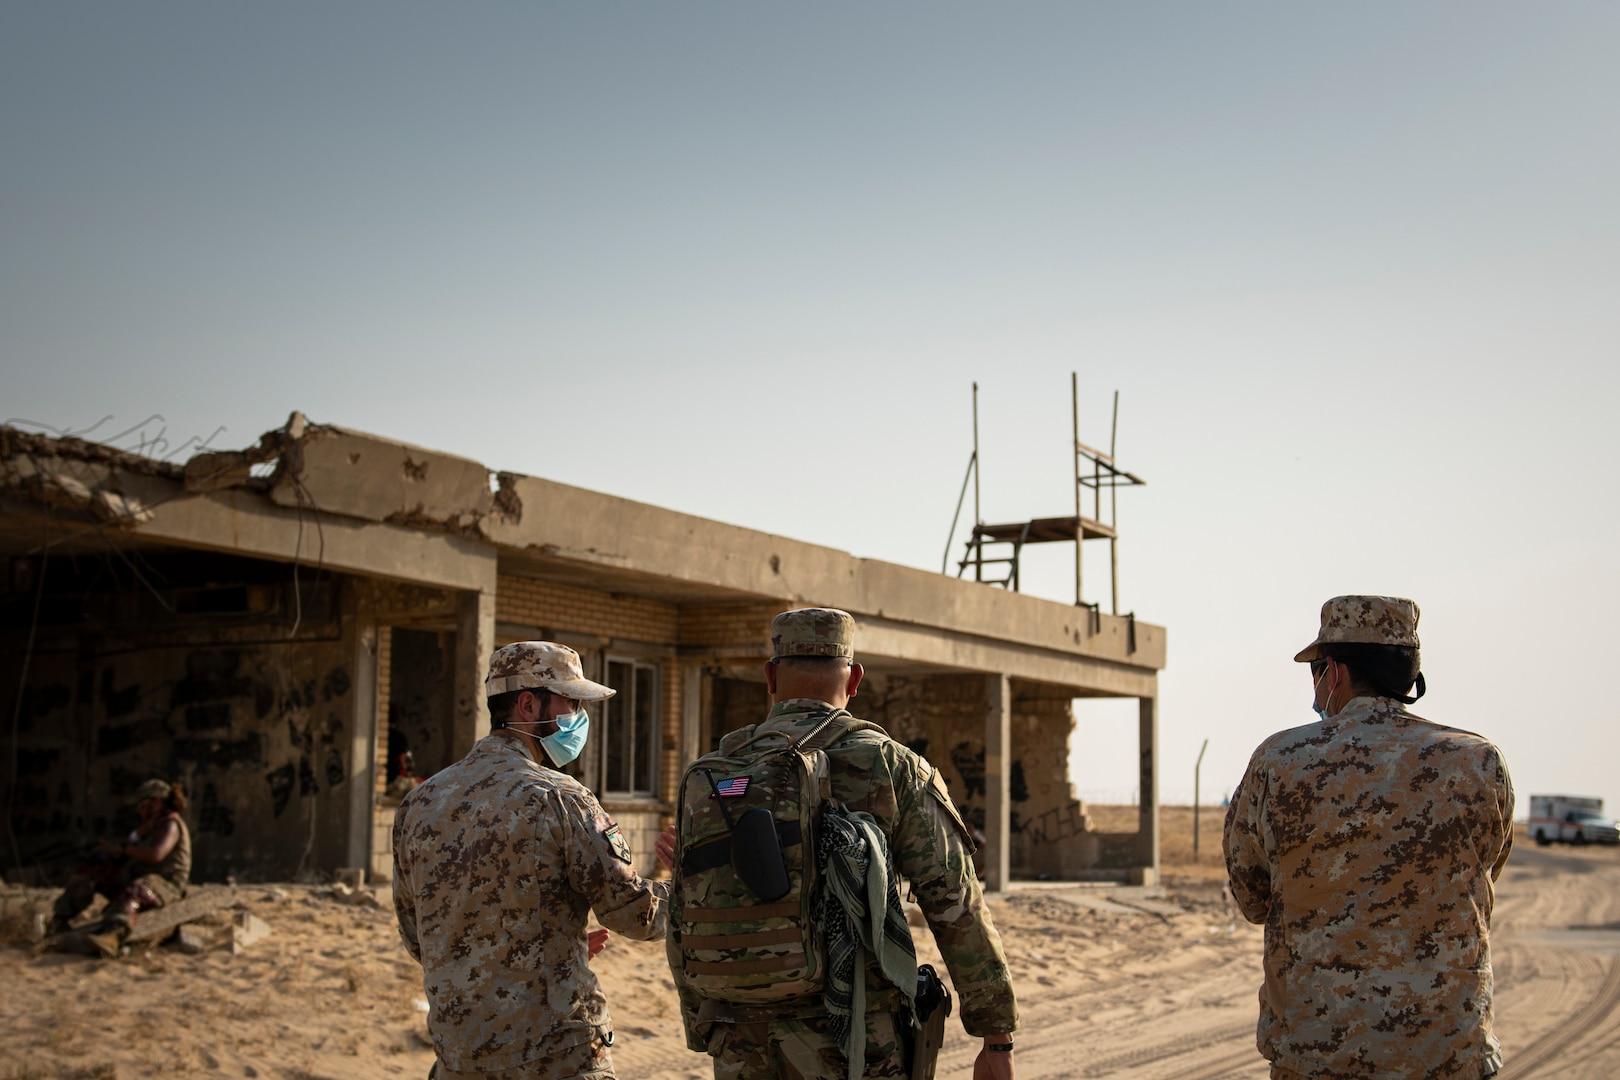 People walk along the desert next to deserting buildings.